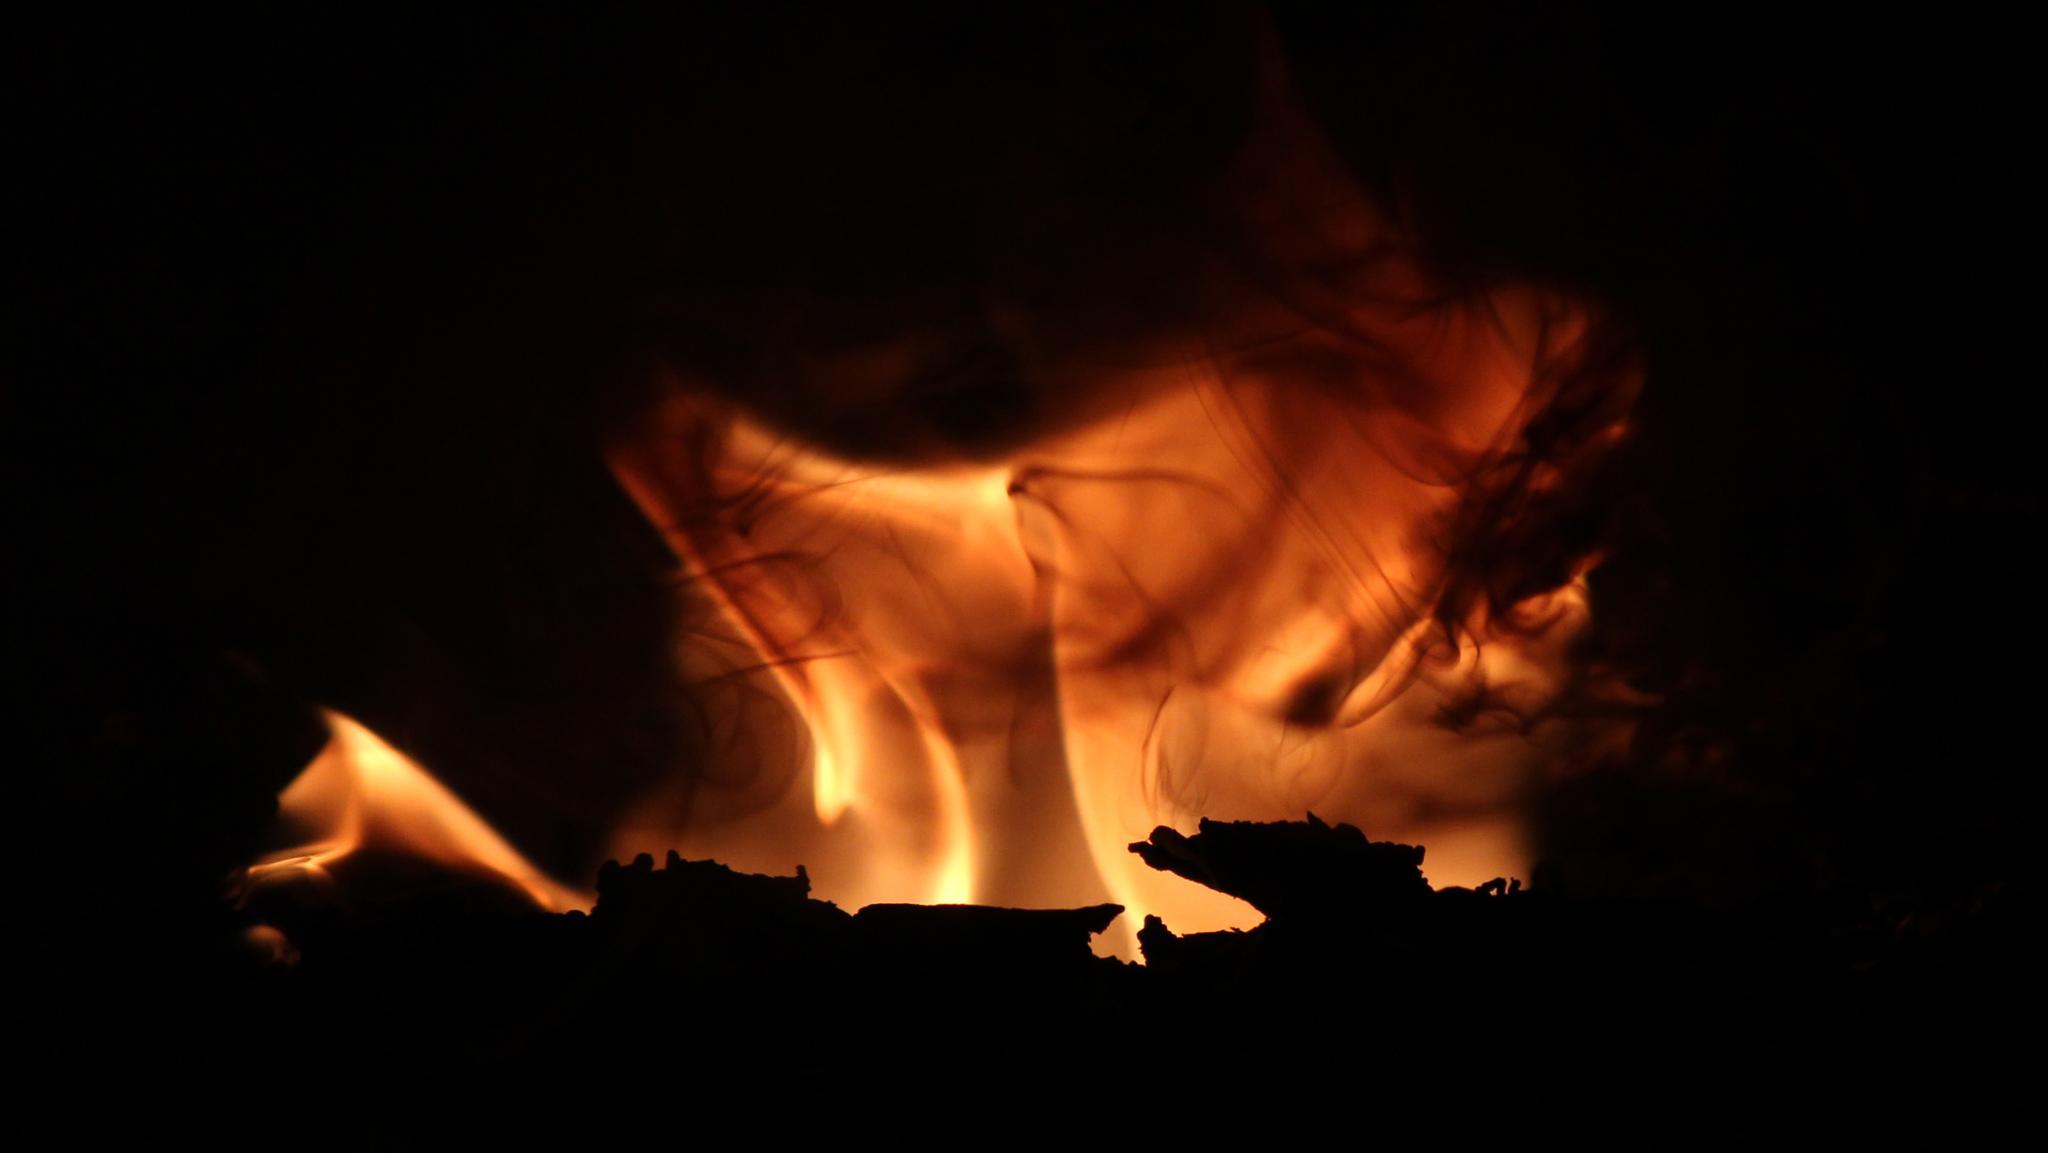 Born by fire by Armando William Sadang Evangelista